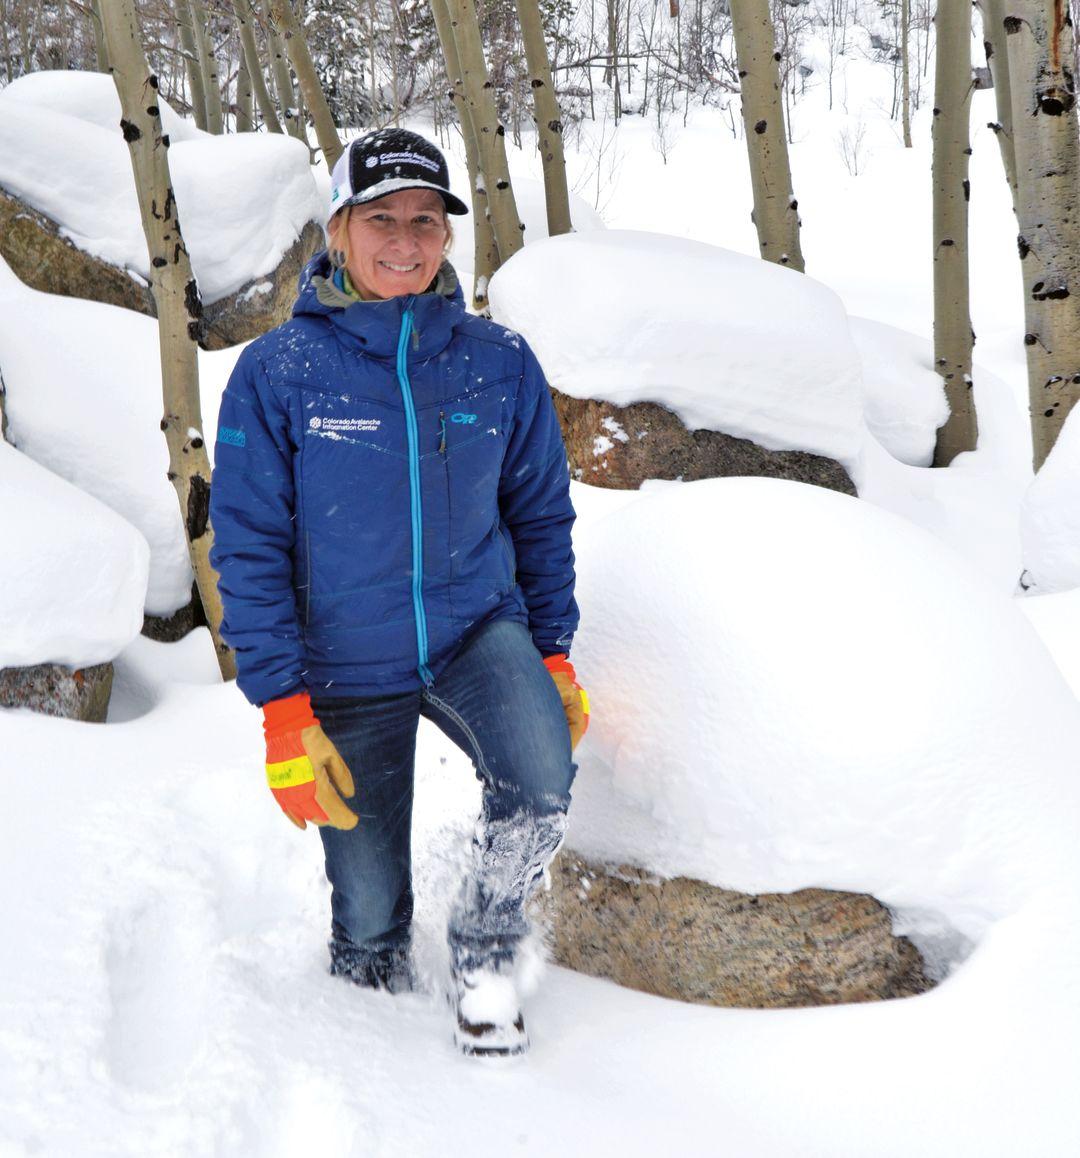 Cosu winter 2015 becs hodgetts jkrcco